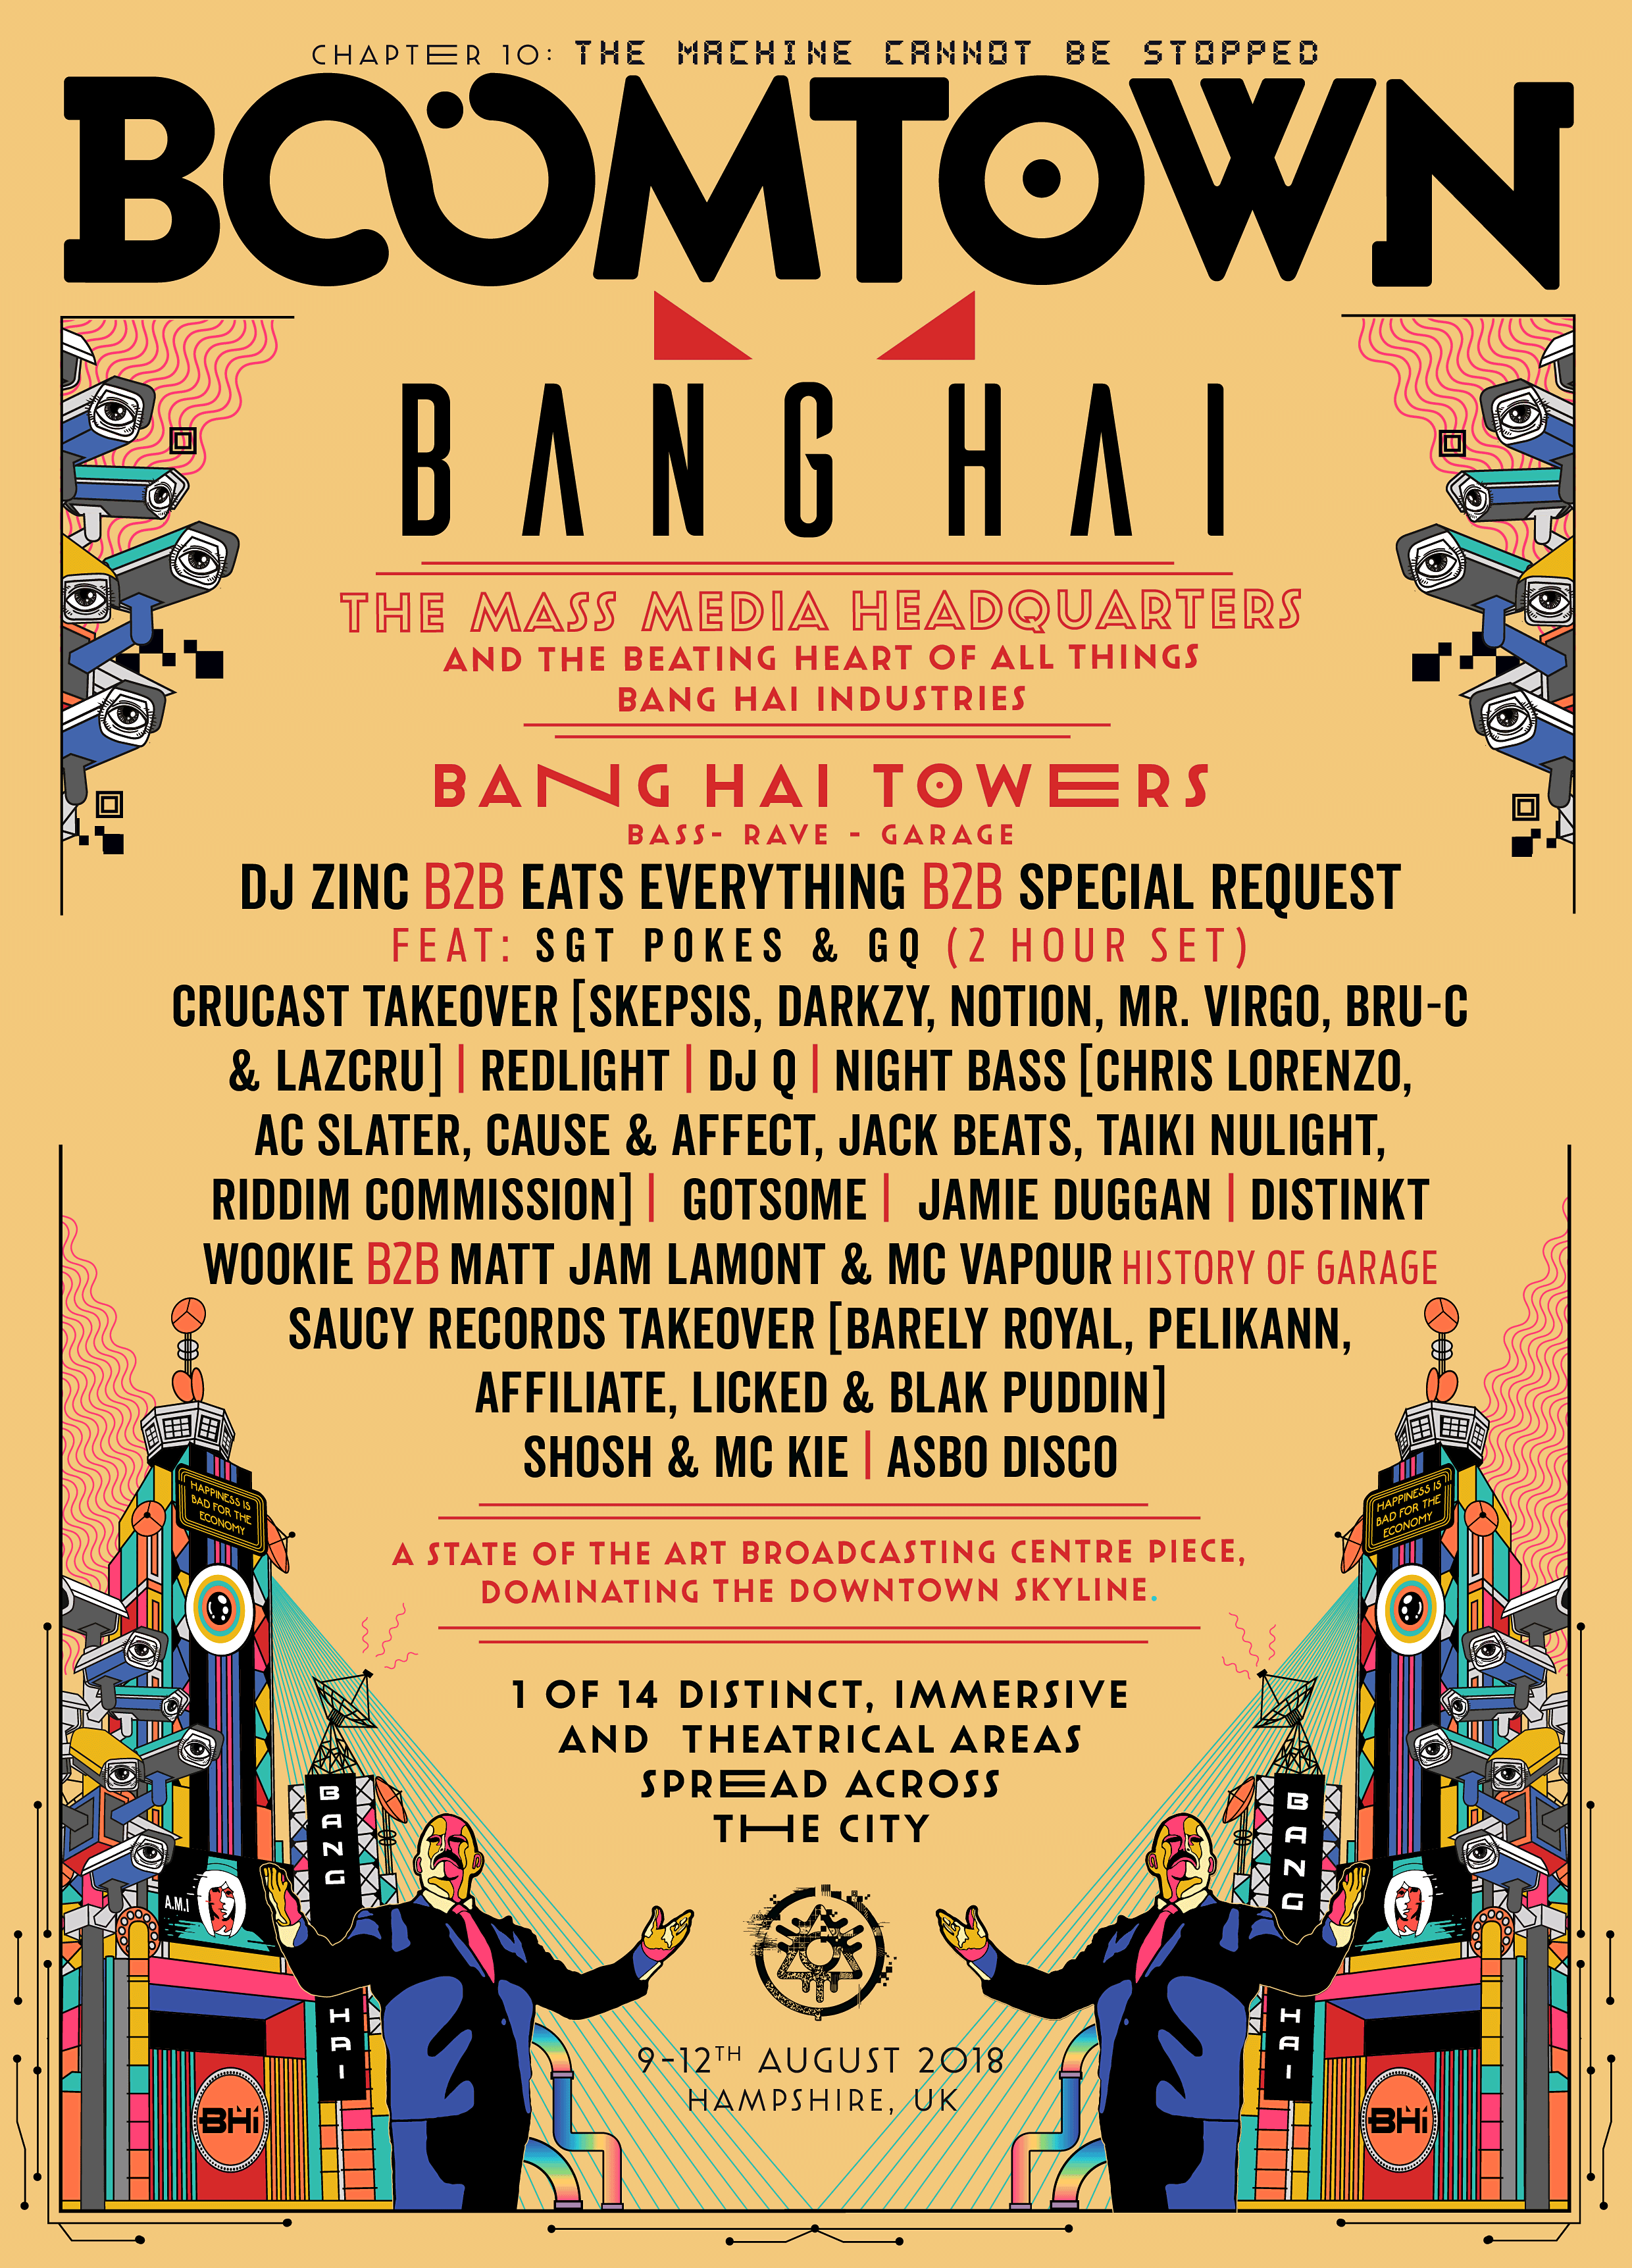 BoomTown - Nabg Hai line up